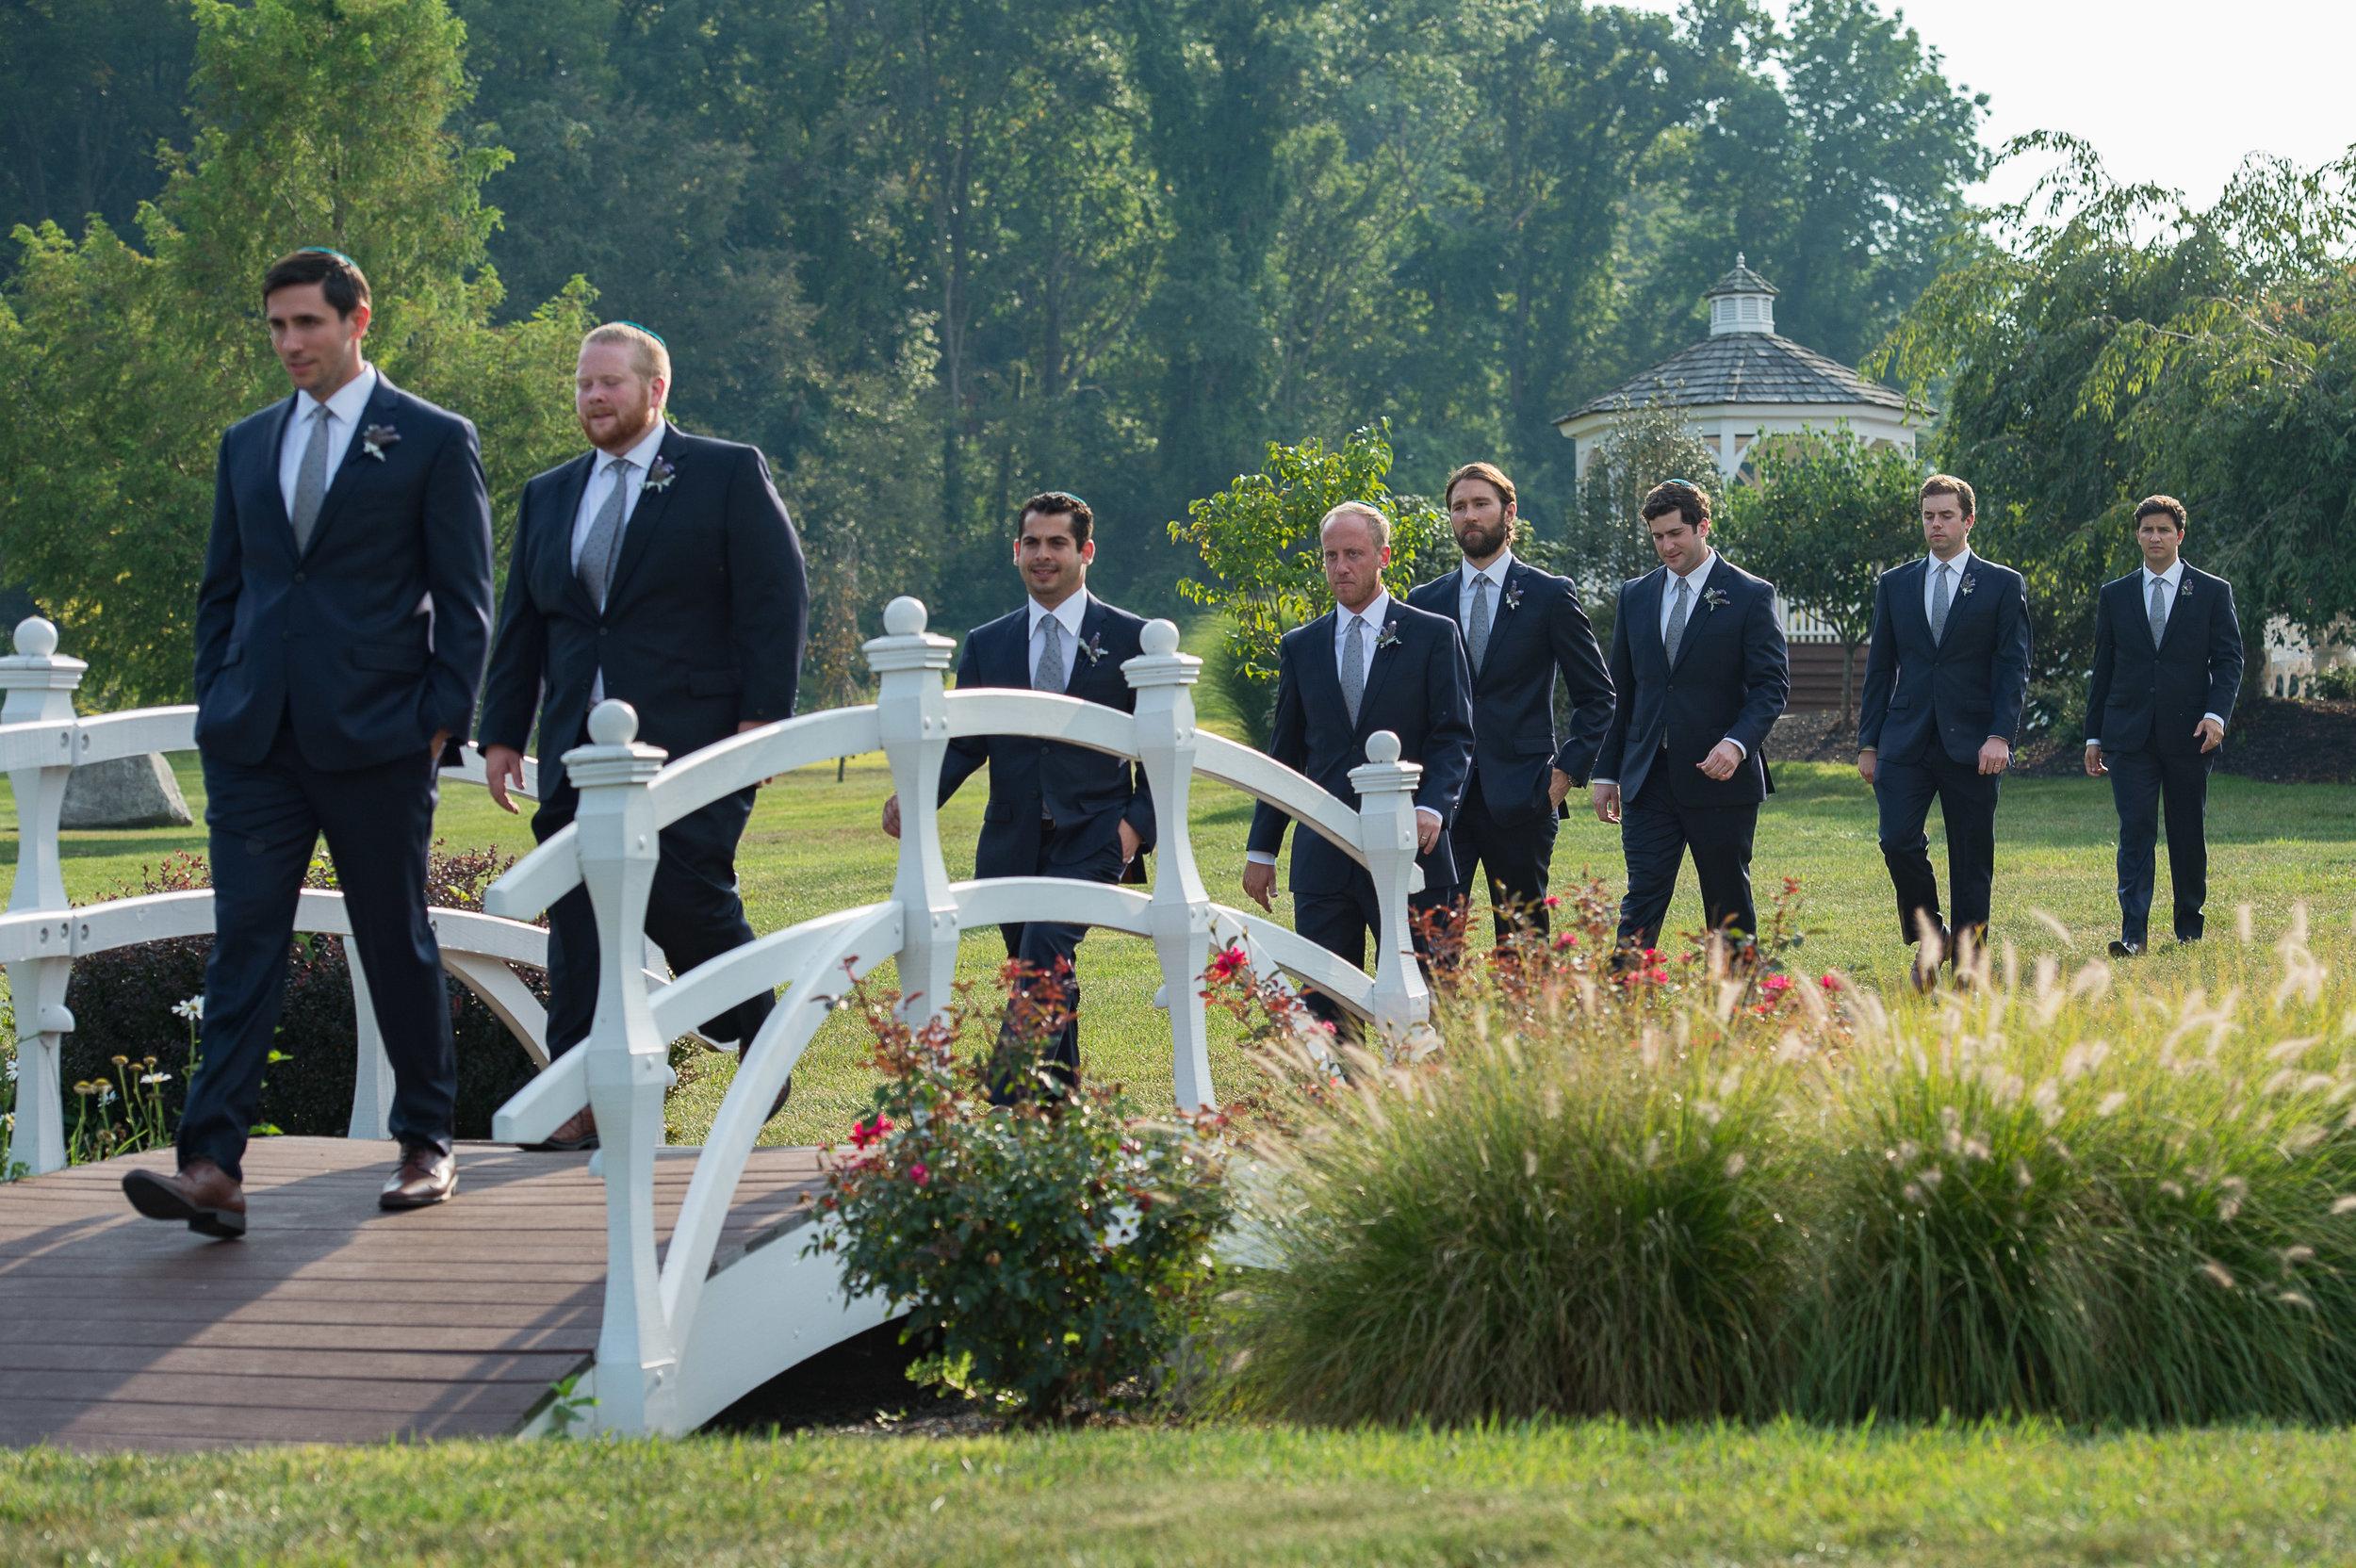 brandywine-wedding-tessie-reveliotis-photography-beautiful-and-blessed-events-043